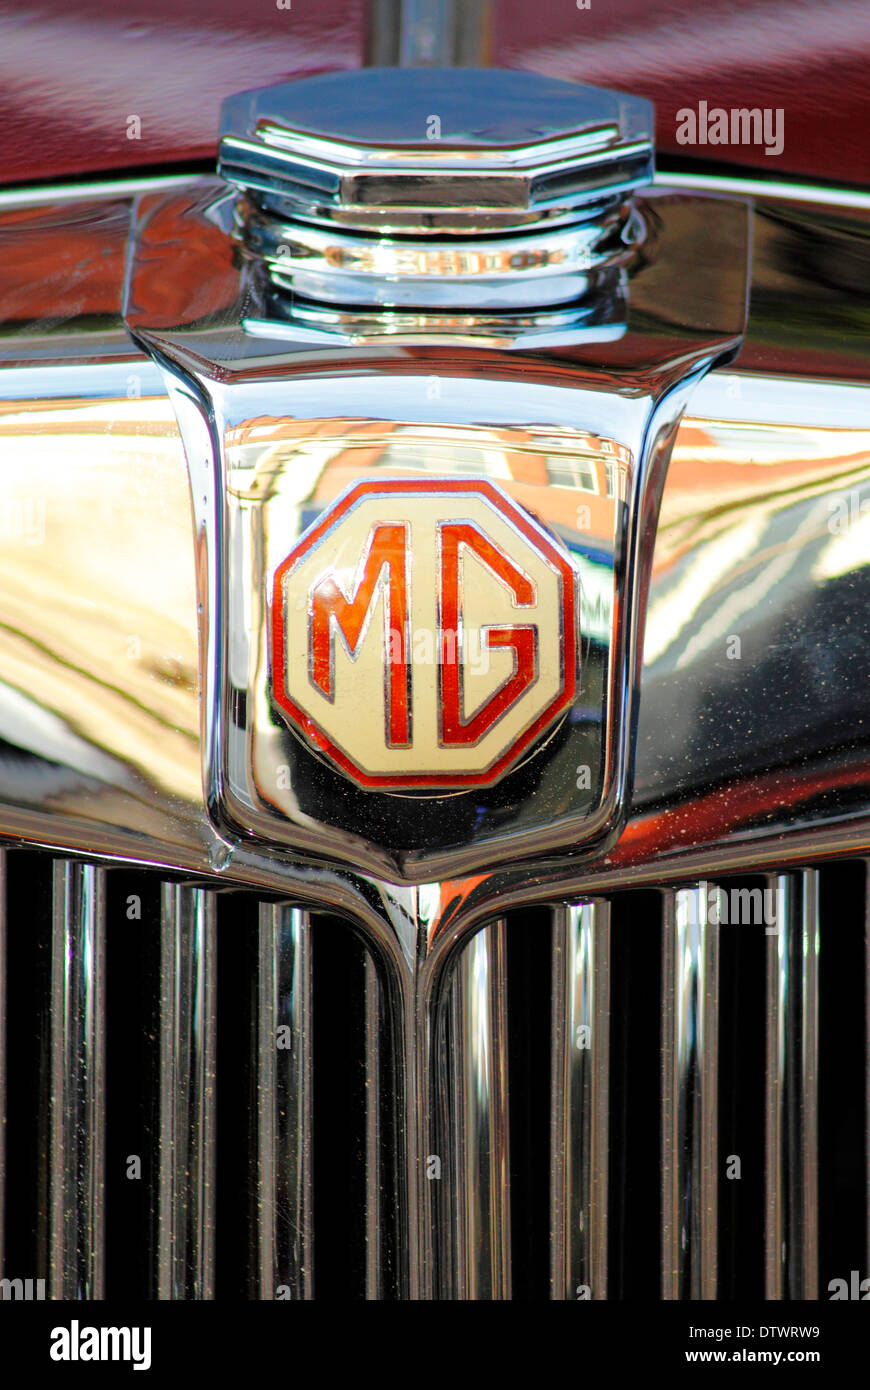 Close Up Mg Vintage Car Logo England Uk Stock Photo 66950389 Alamy